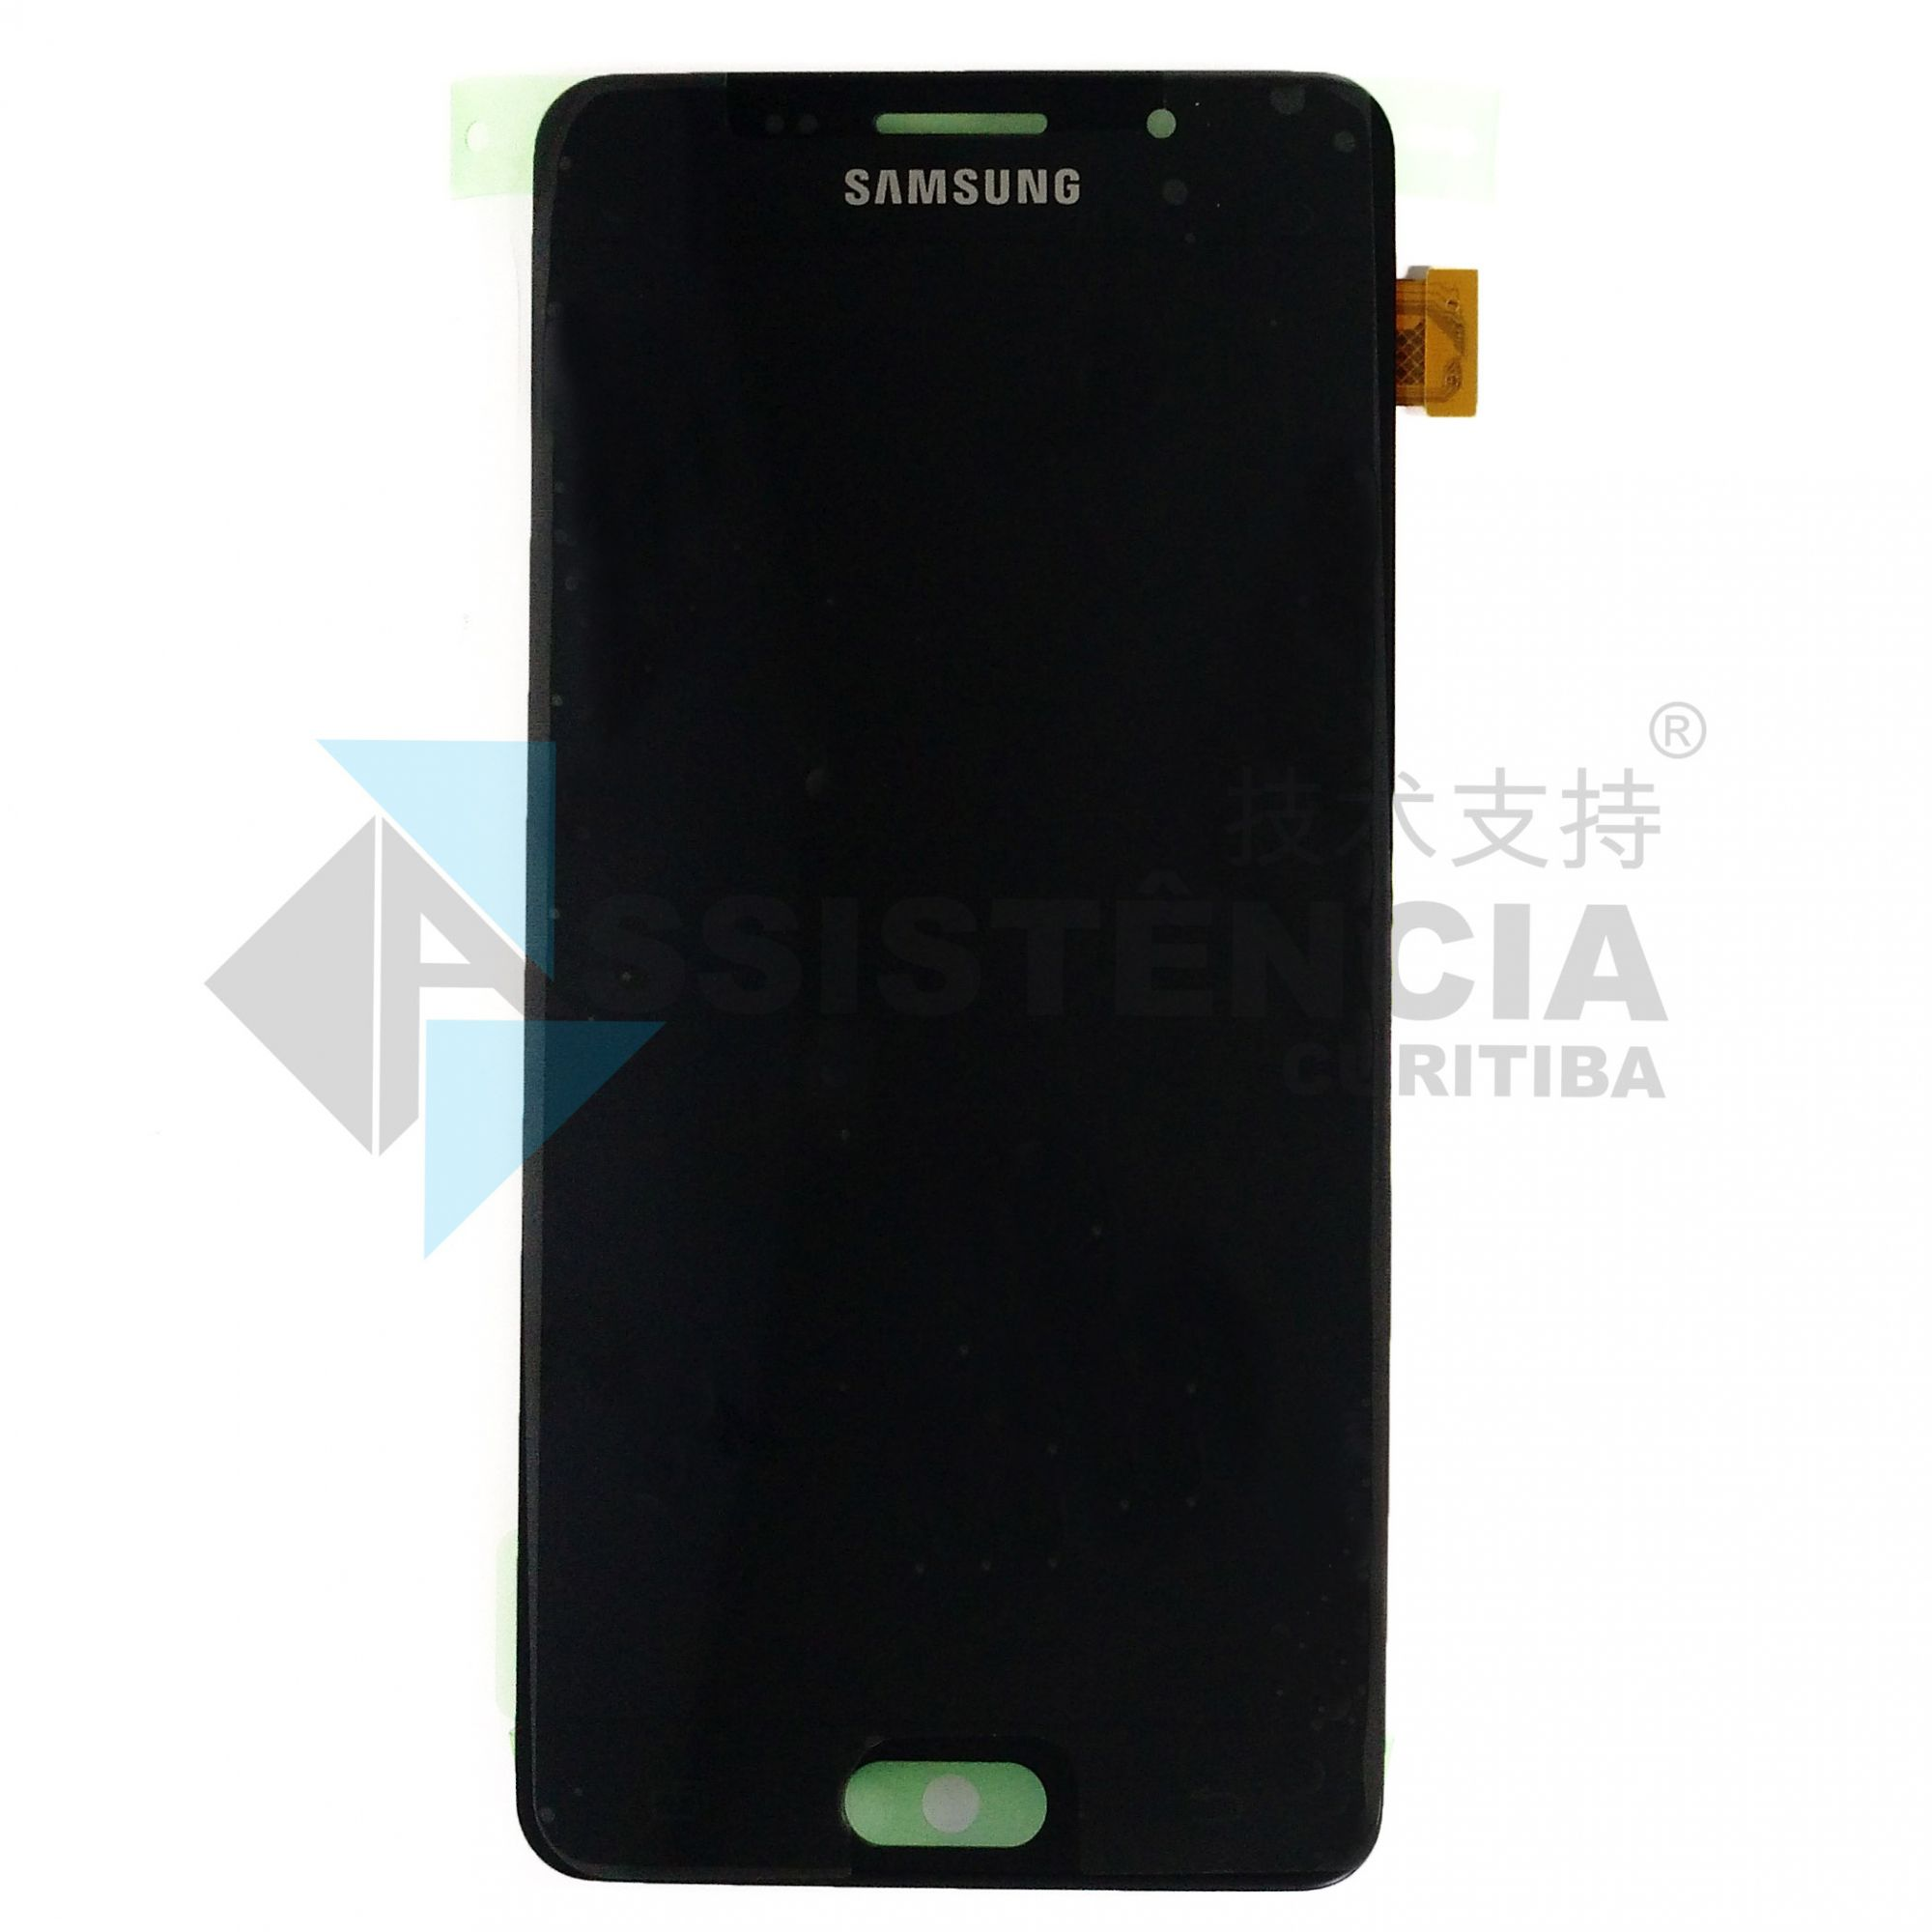 Tela Display Samsung Galaxy A5 A510 2016 Original Preto